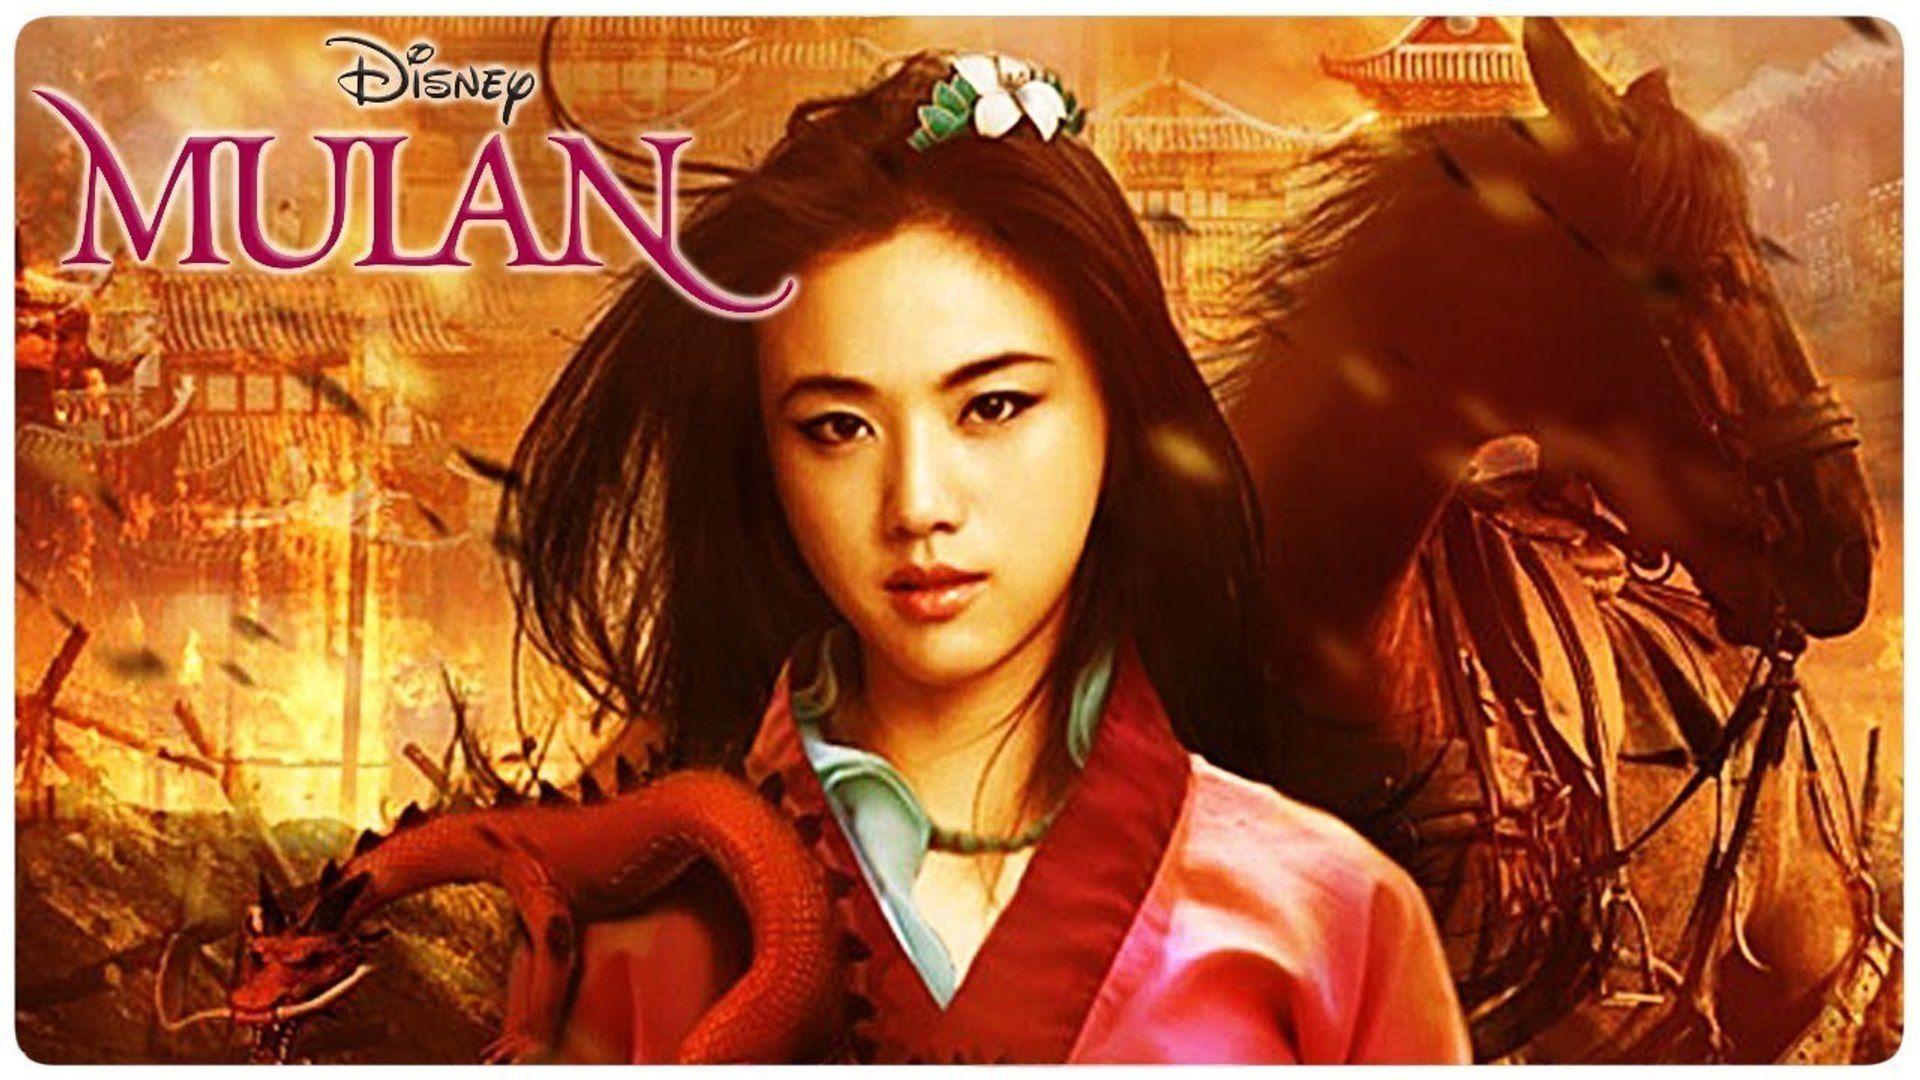 mulan - افزایش انتقادات به شرکت فیلمسازی Disney برای بازسازی فیلم Mulan